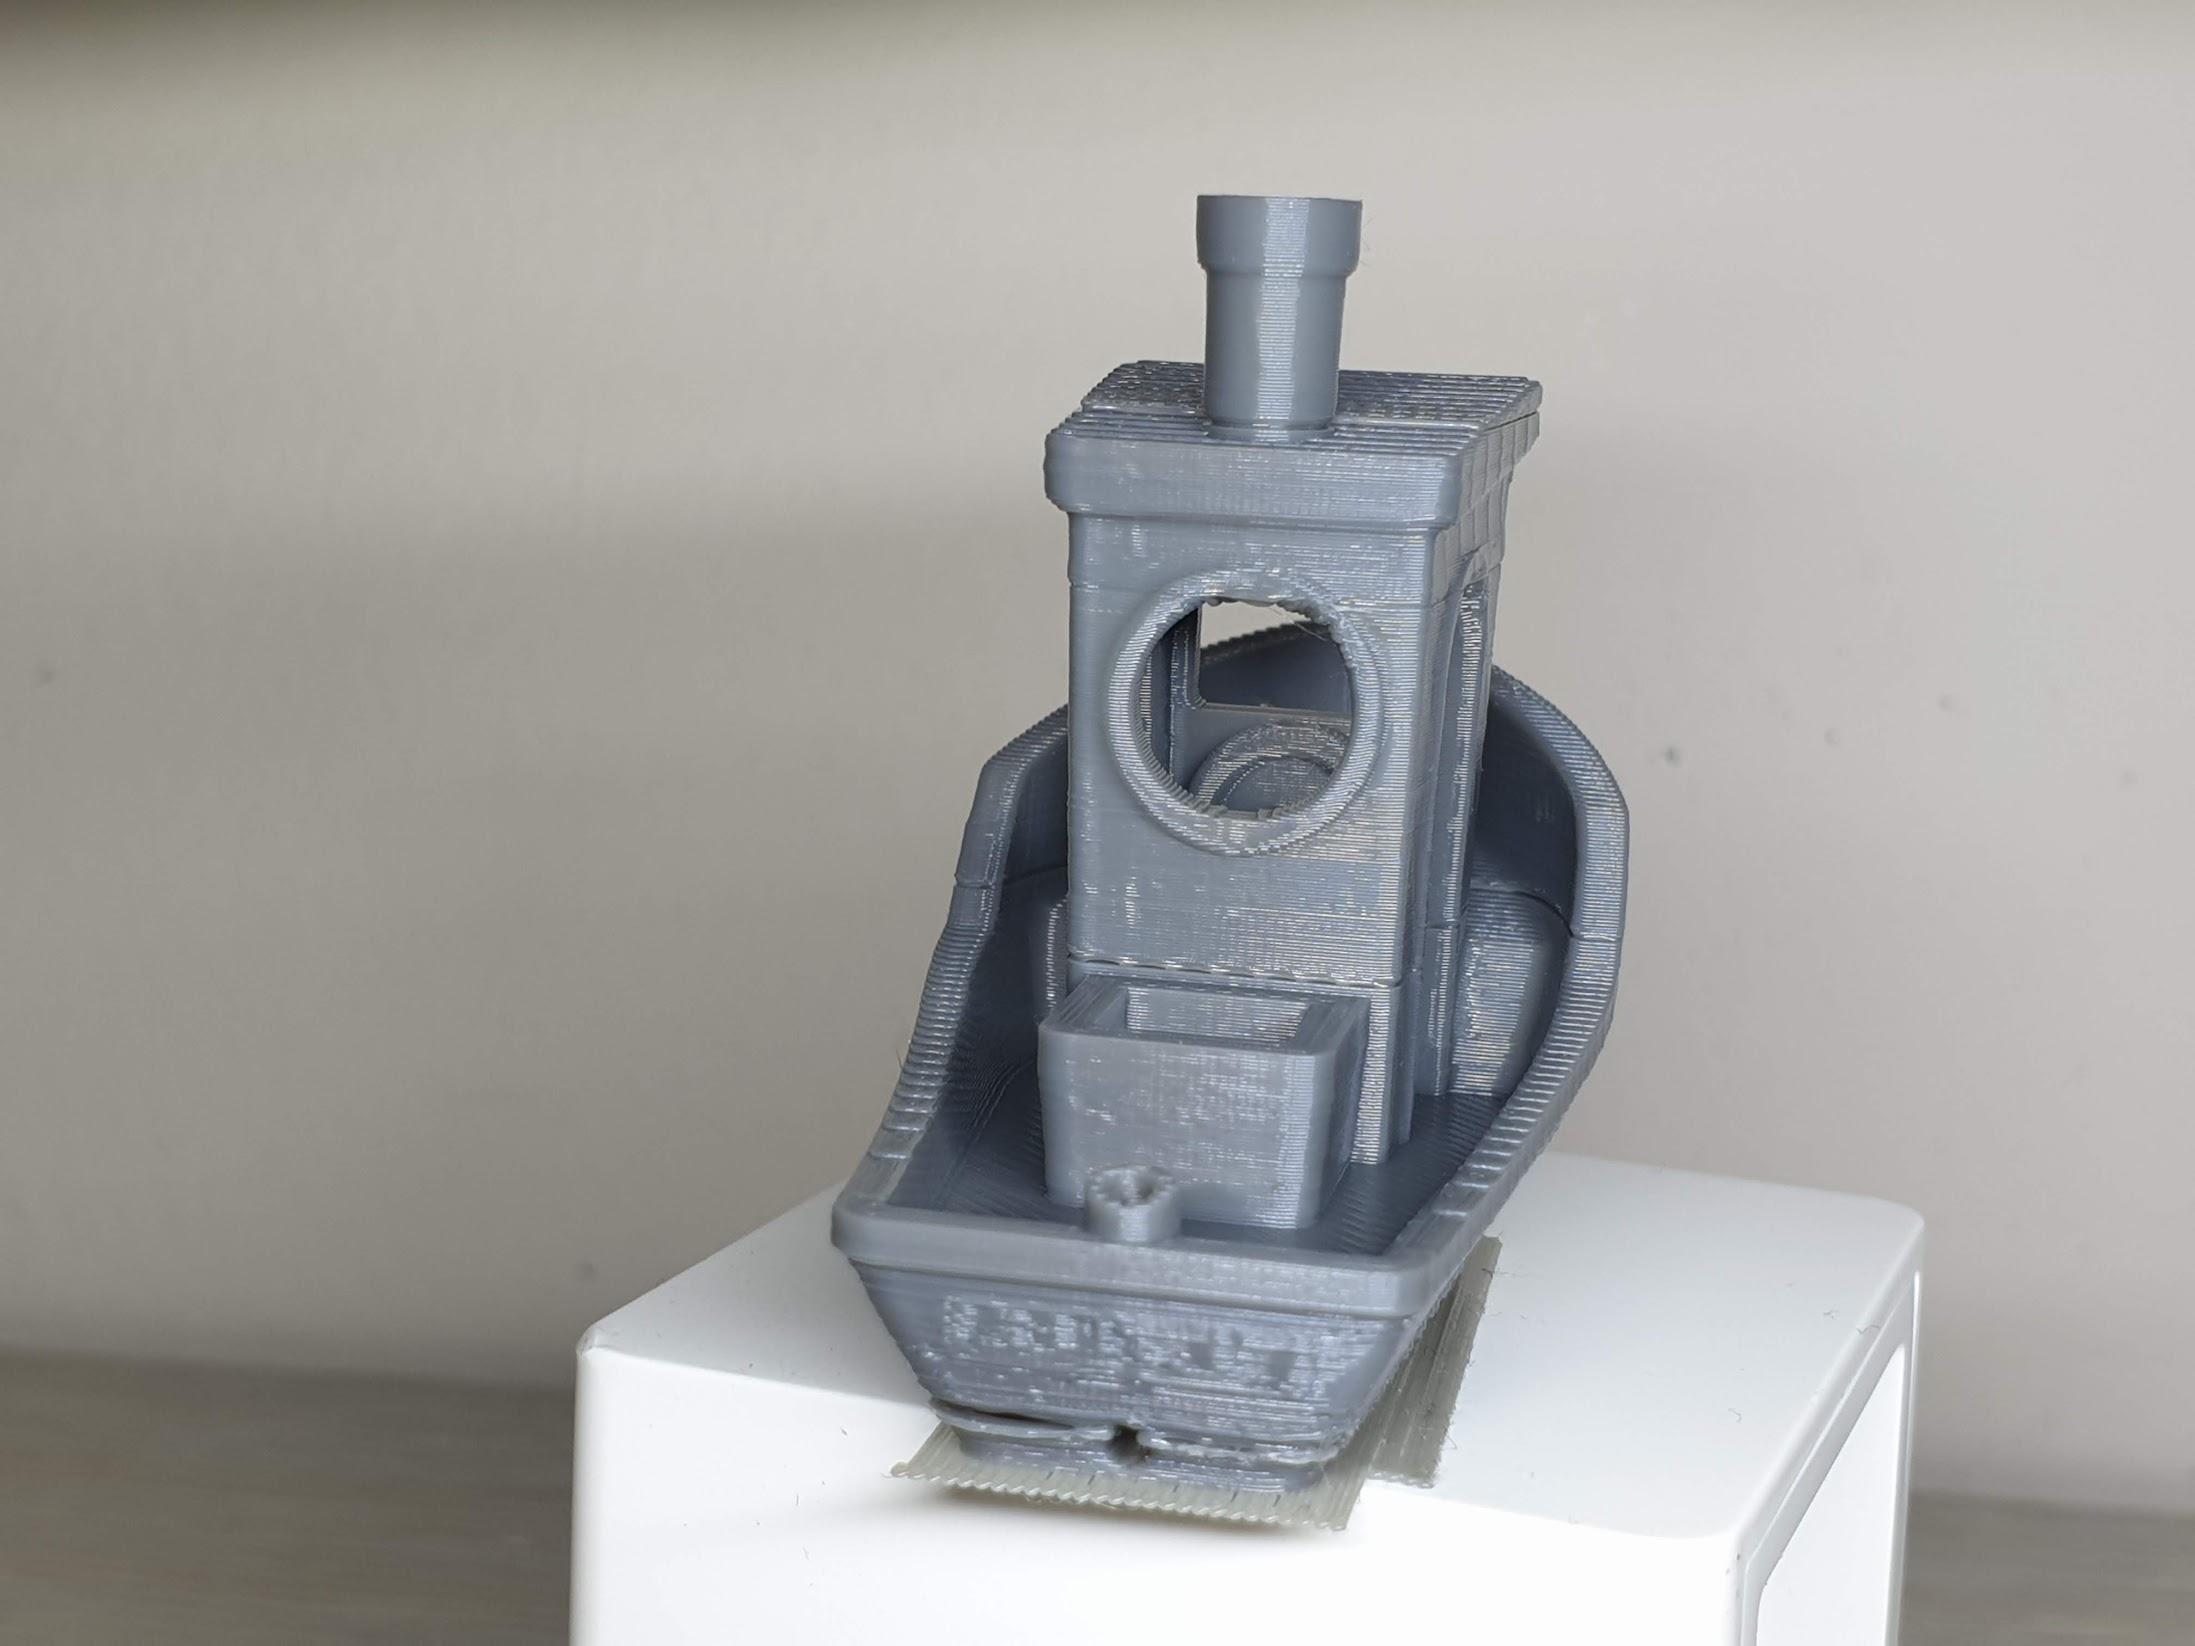 3D Benchy 1 | Cube2 Mini Review - 3D Printer for Kids